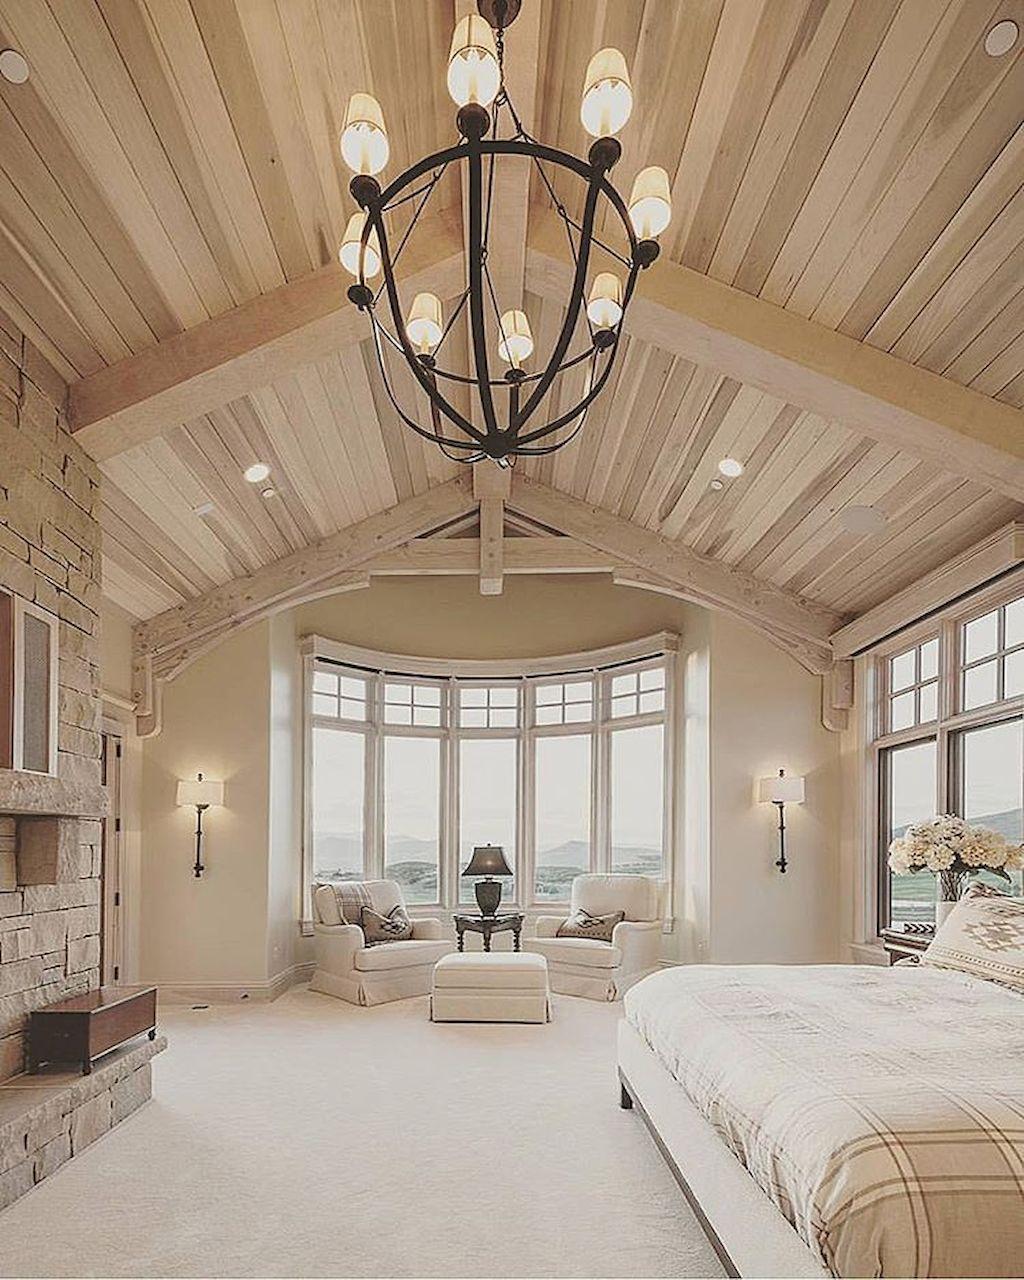 Adorable 60 Glamorous Dream Master Bedroom Decor